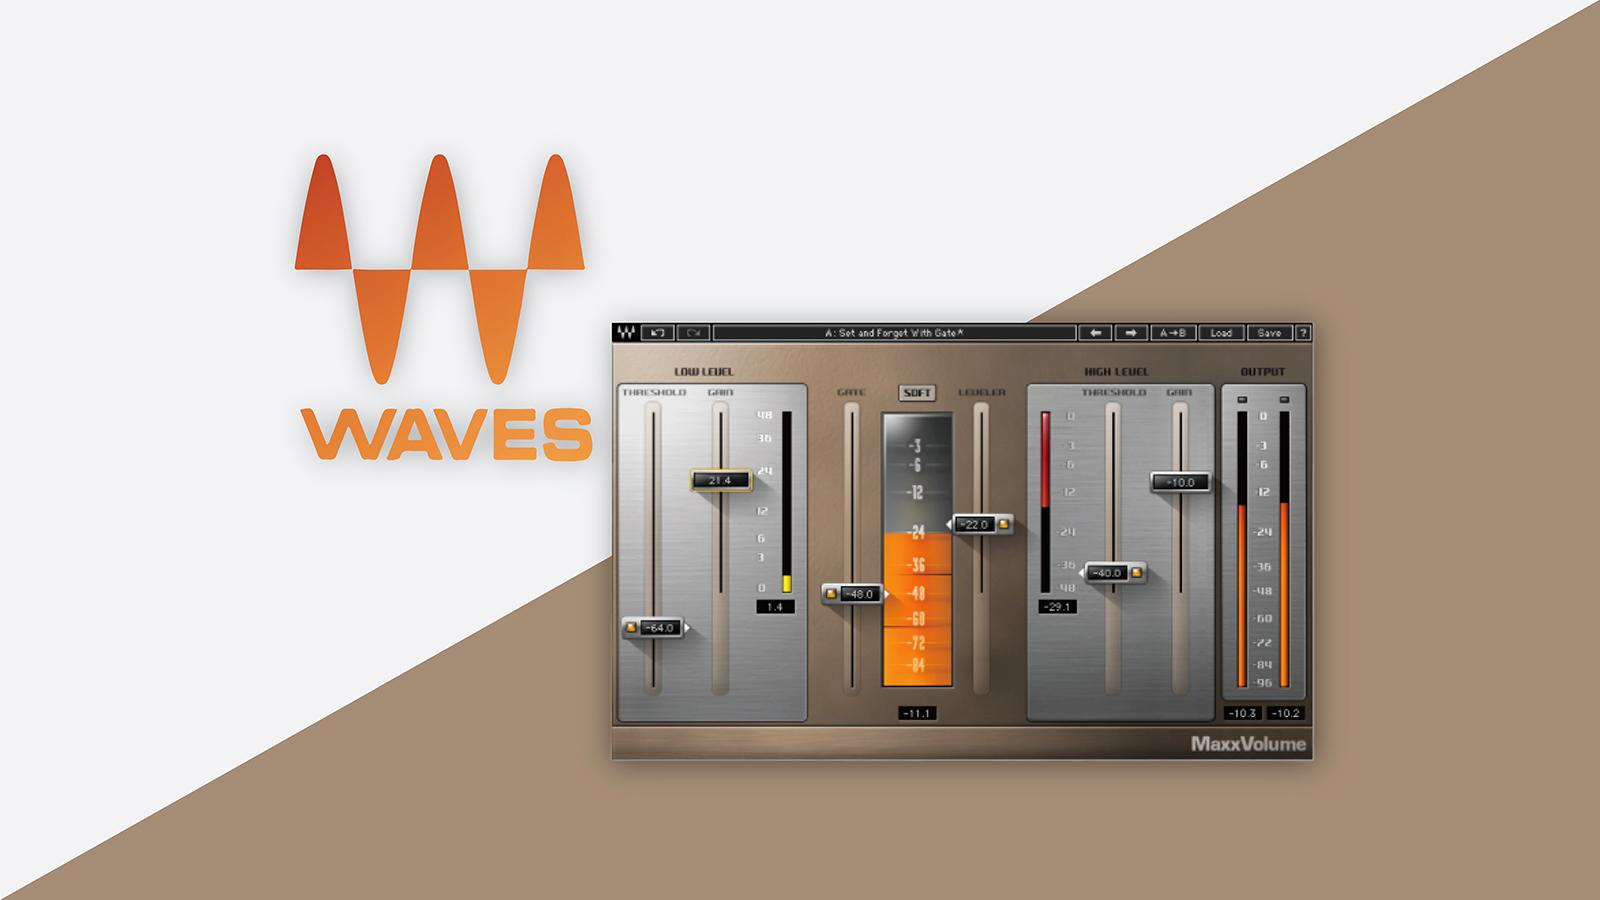 【無料】Waves Maxx Volumeが期間限定で無償配布中!